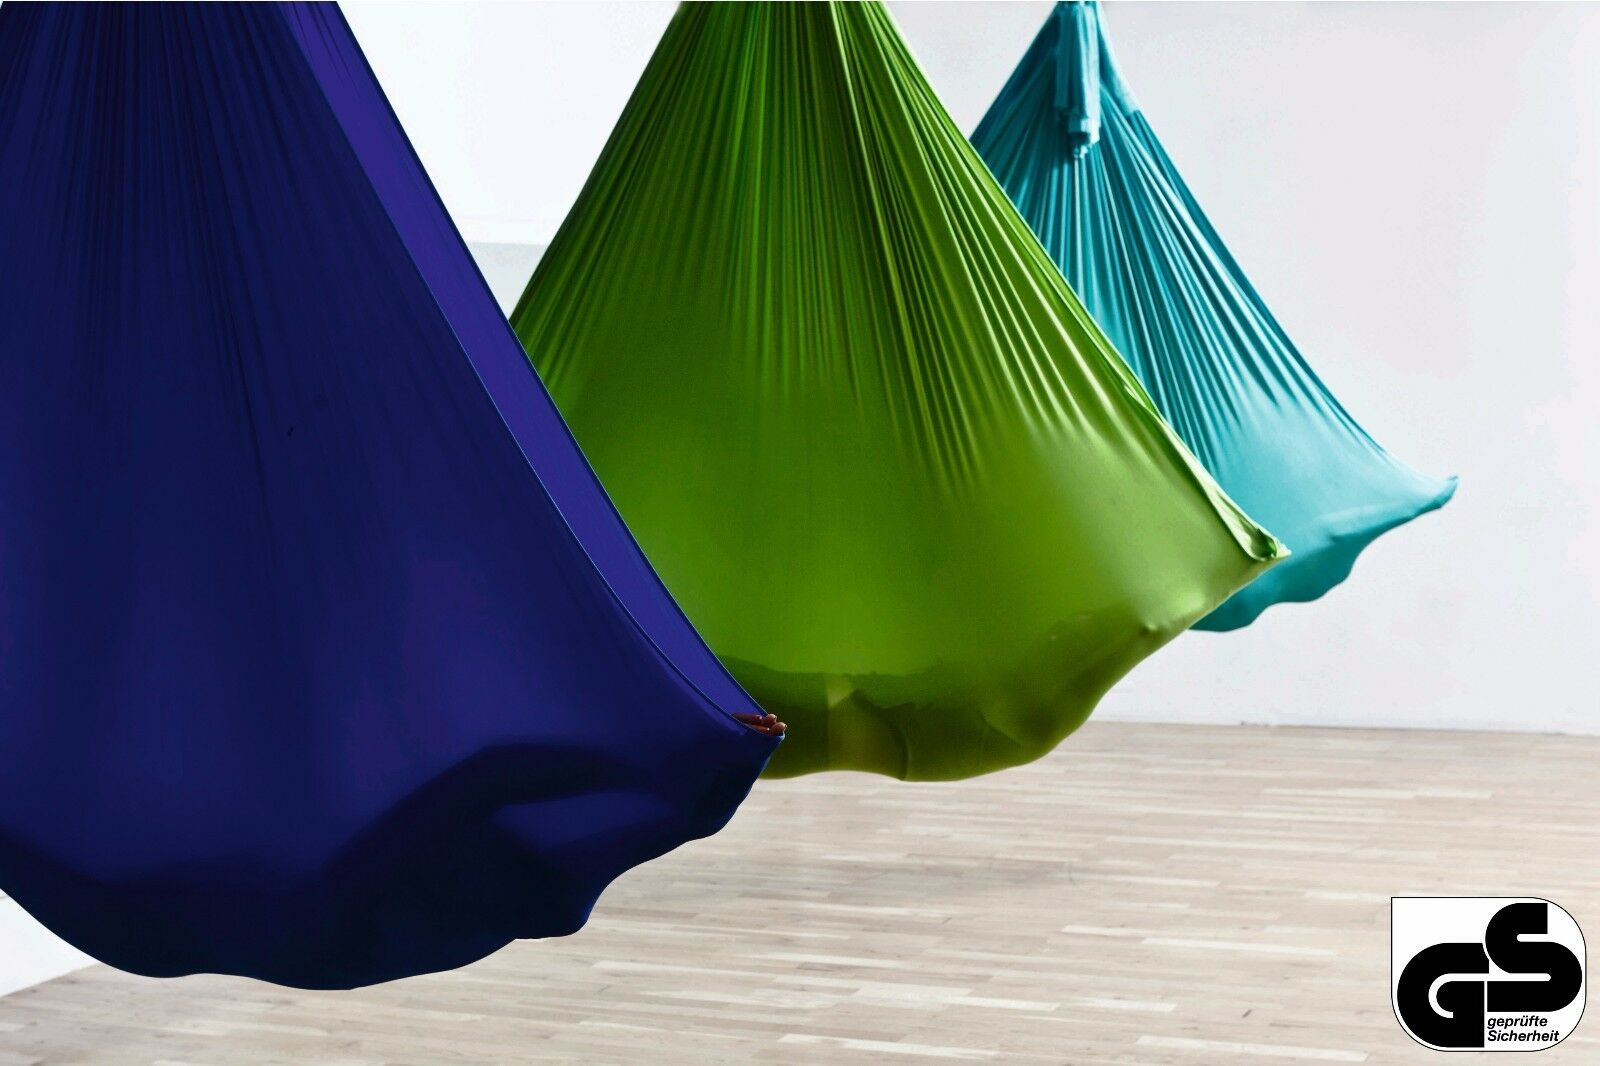 Aerial-Yoga-Tuch im Set inkl. Zubehör für Yoga, Fitness, Pilates in 32 Farben